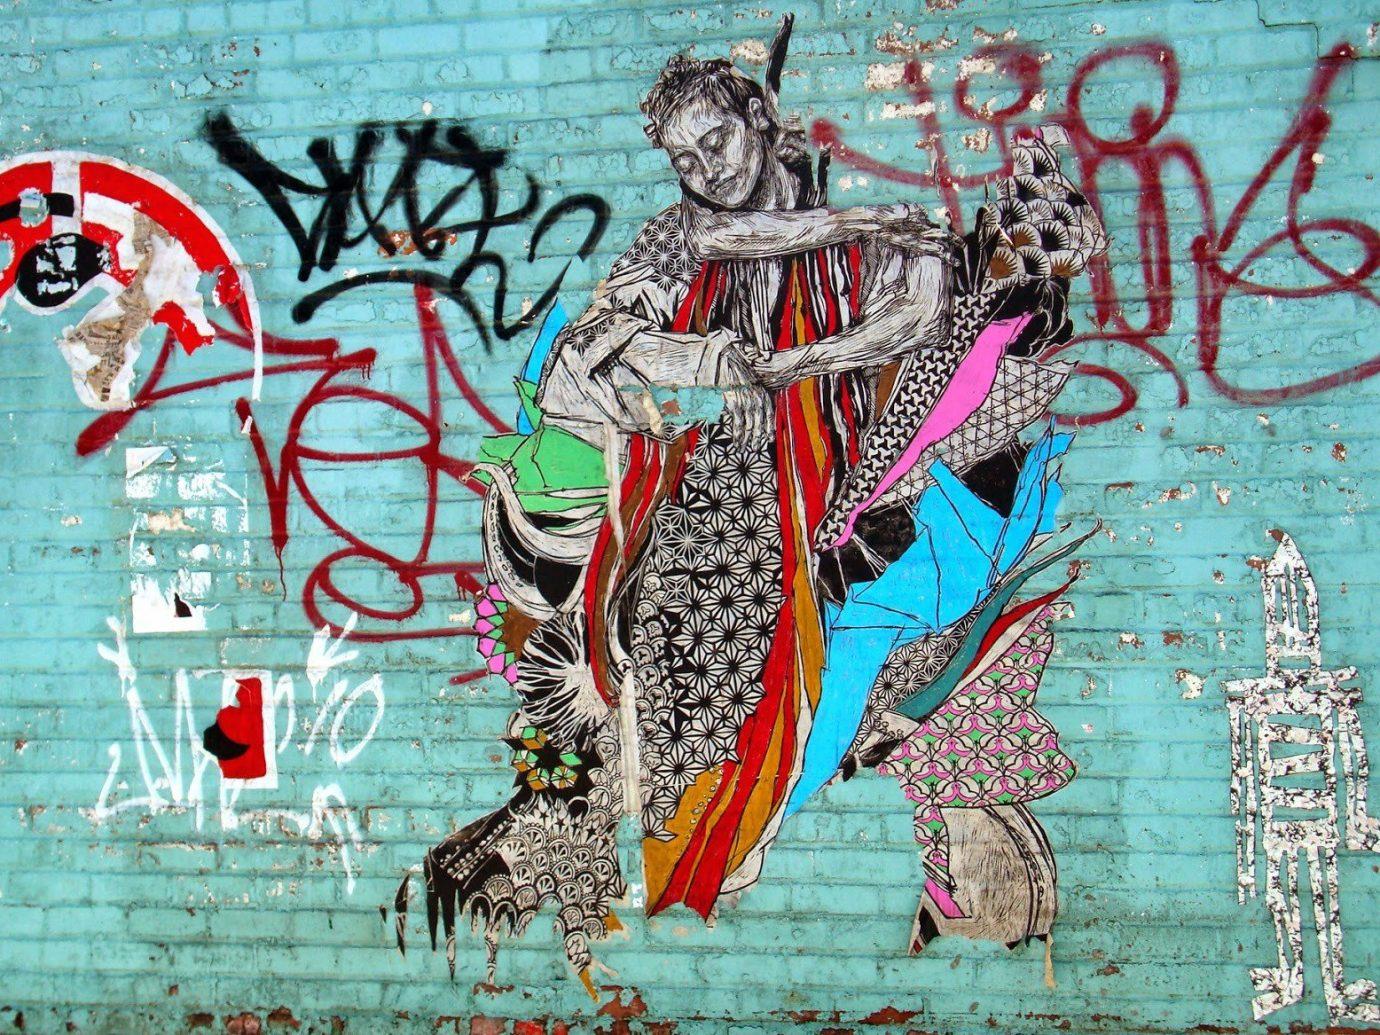 art Arts + Culture brick wall City city streets colorful graffiti street art streets urban map mural illustration modern art